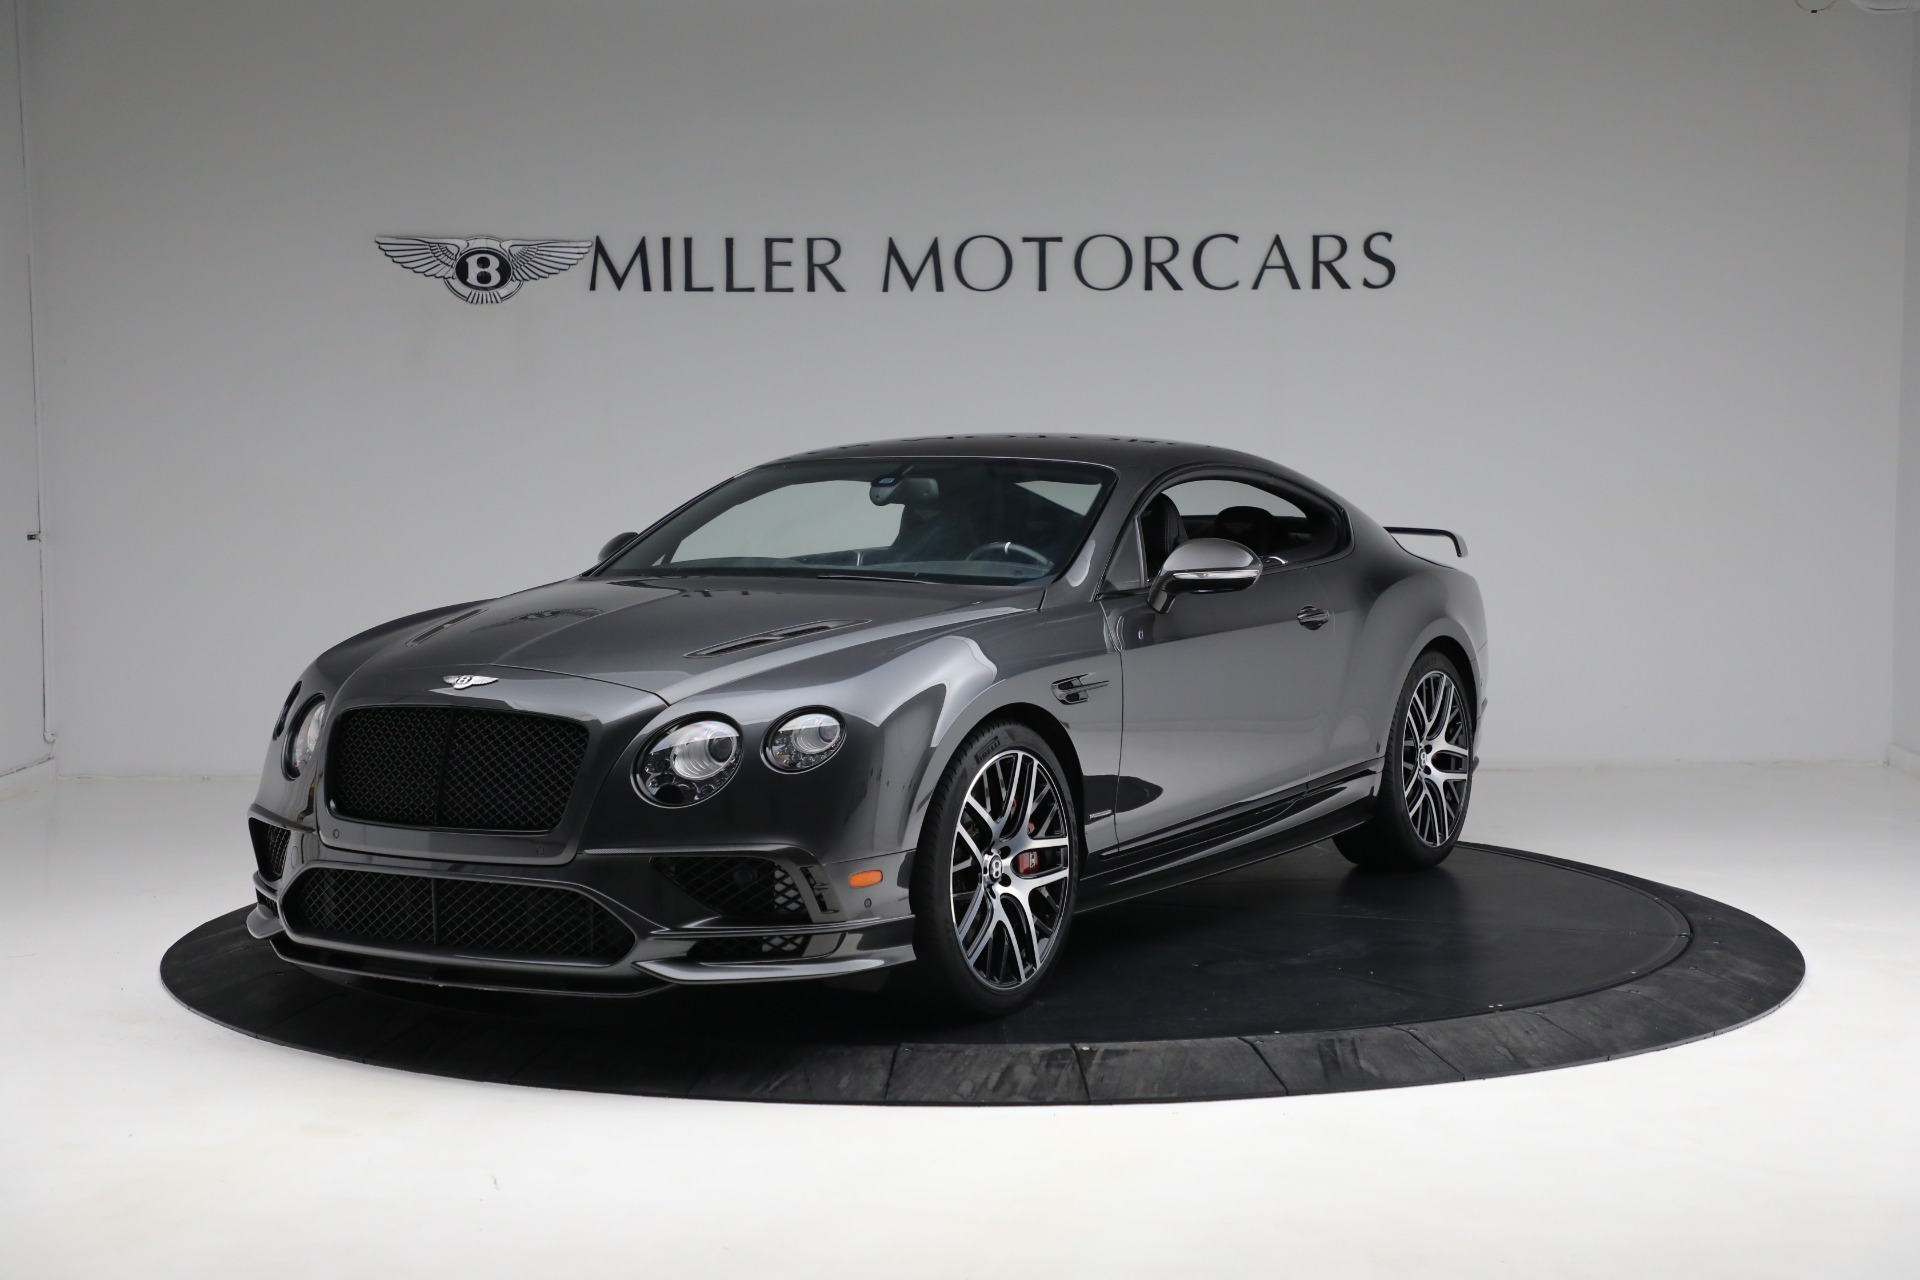 Used 2017 Bentley Continental GT Supersports for sale $189,900 at Alfa Romeo of Westport in Westport CT 06880 1